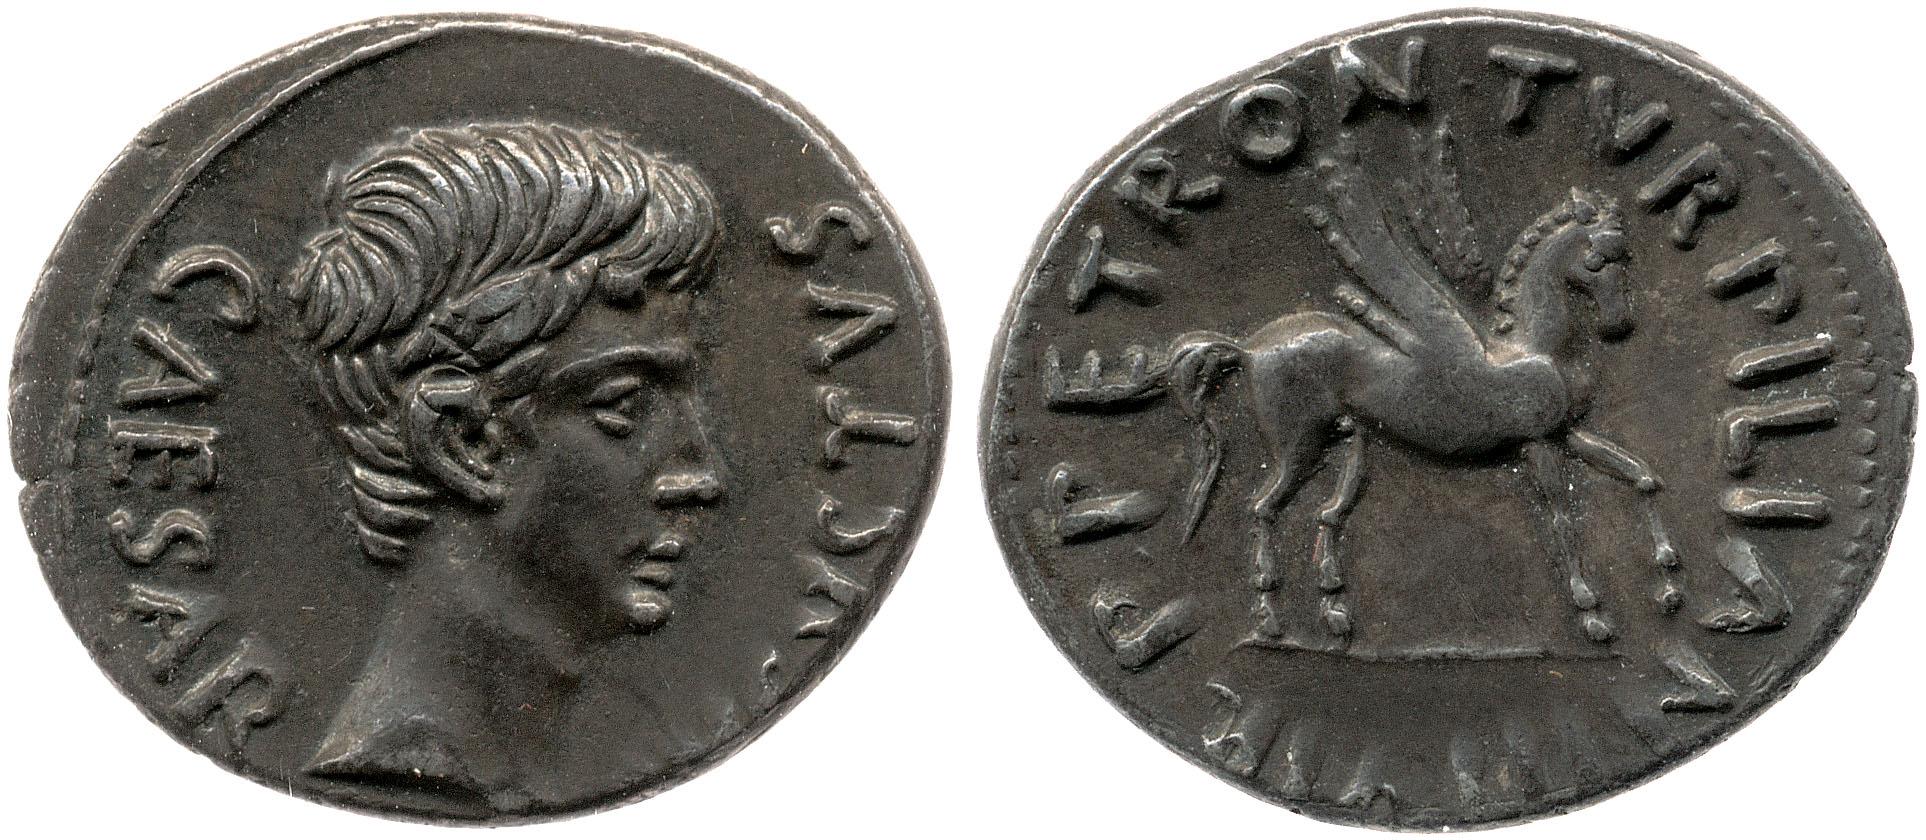 You are currently viewing 2054AU – Denier Auguste – P.Petronius Turpilianus